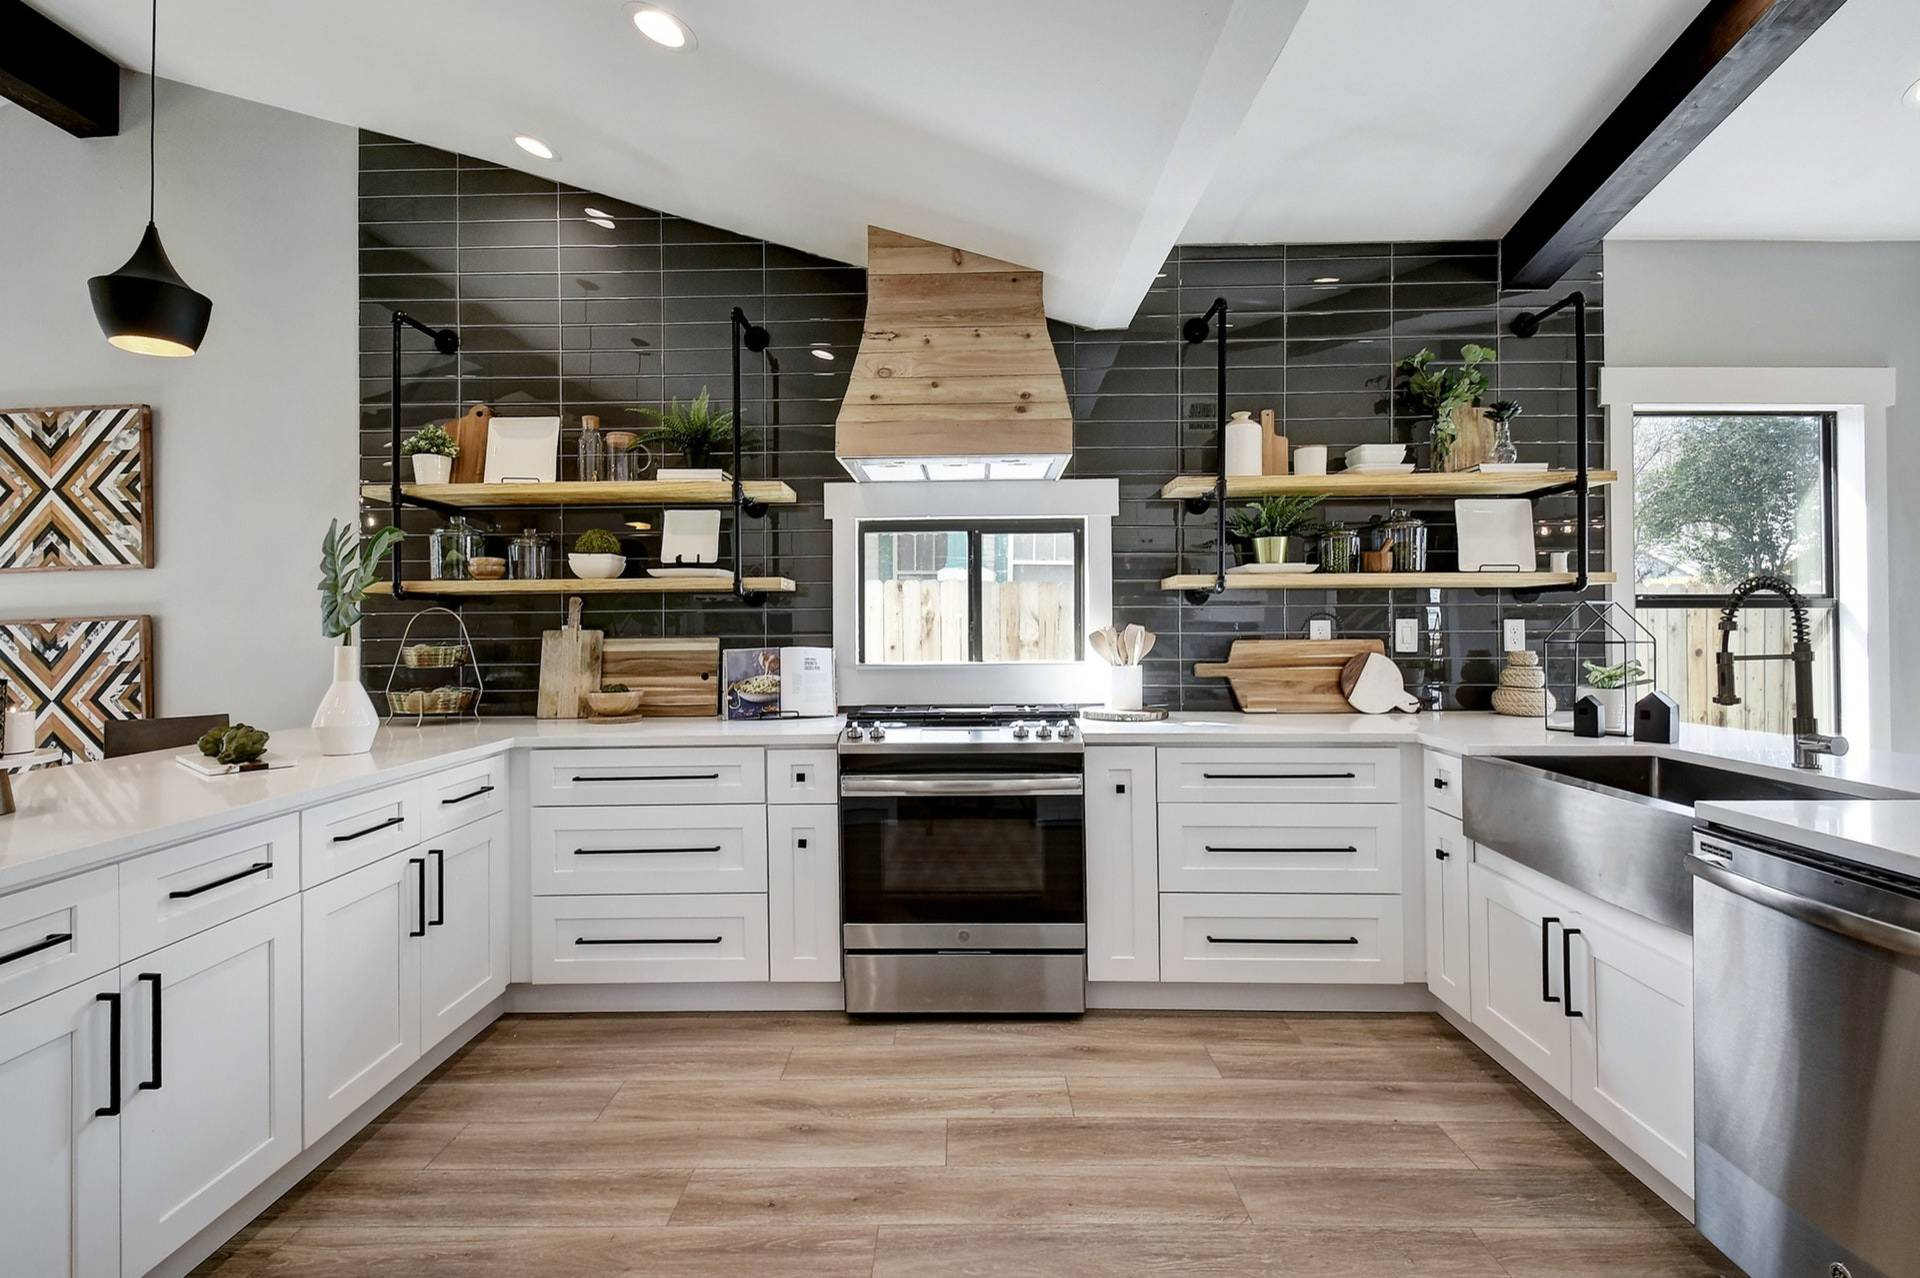 White Cabinets Black Appliances Contemporary Kitchen Bronze Pulls Carrara Marble Island Carrara Marble Slab Backsplash Floating Shelves Open Floor Plan